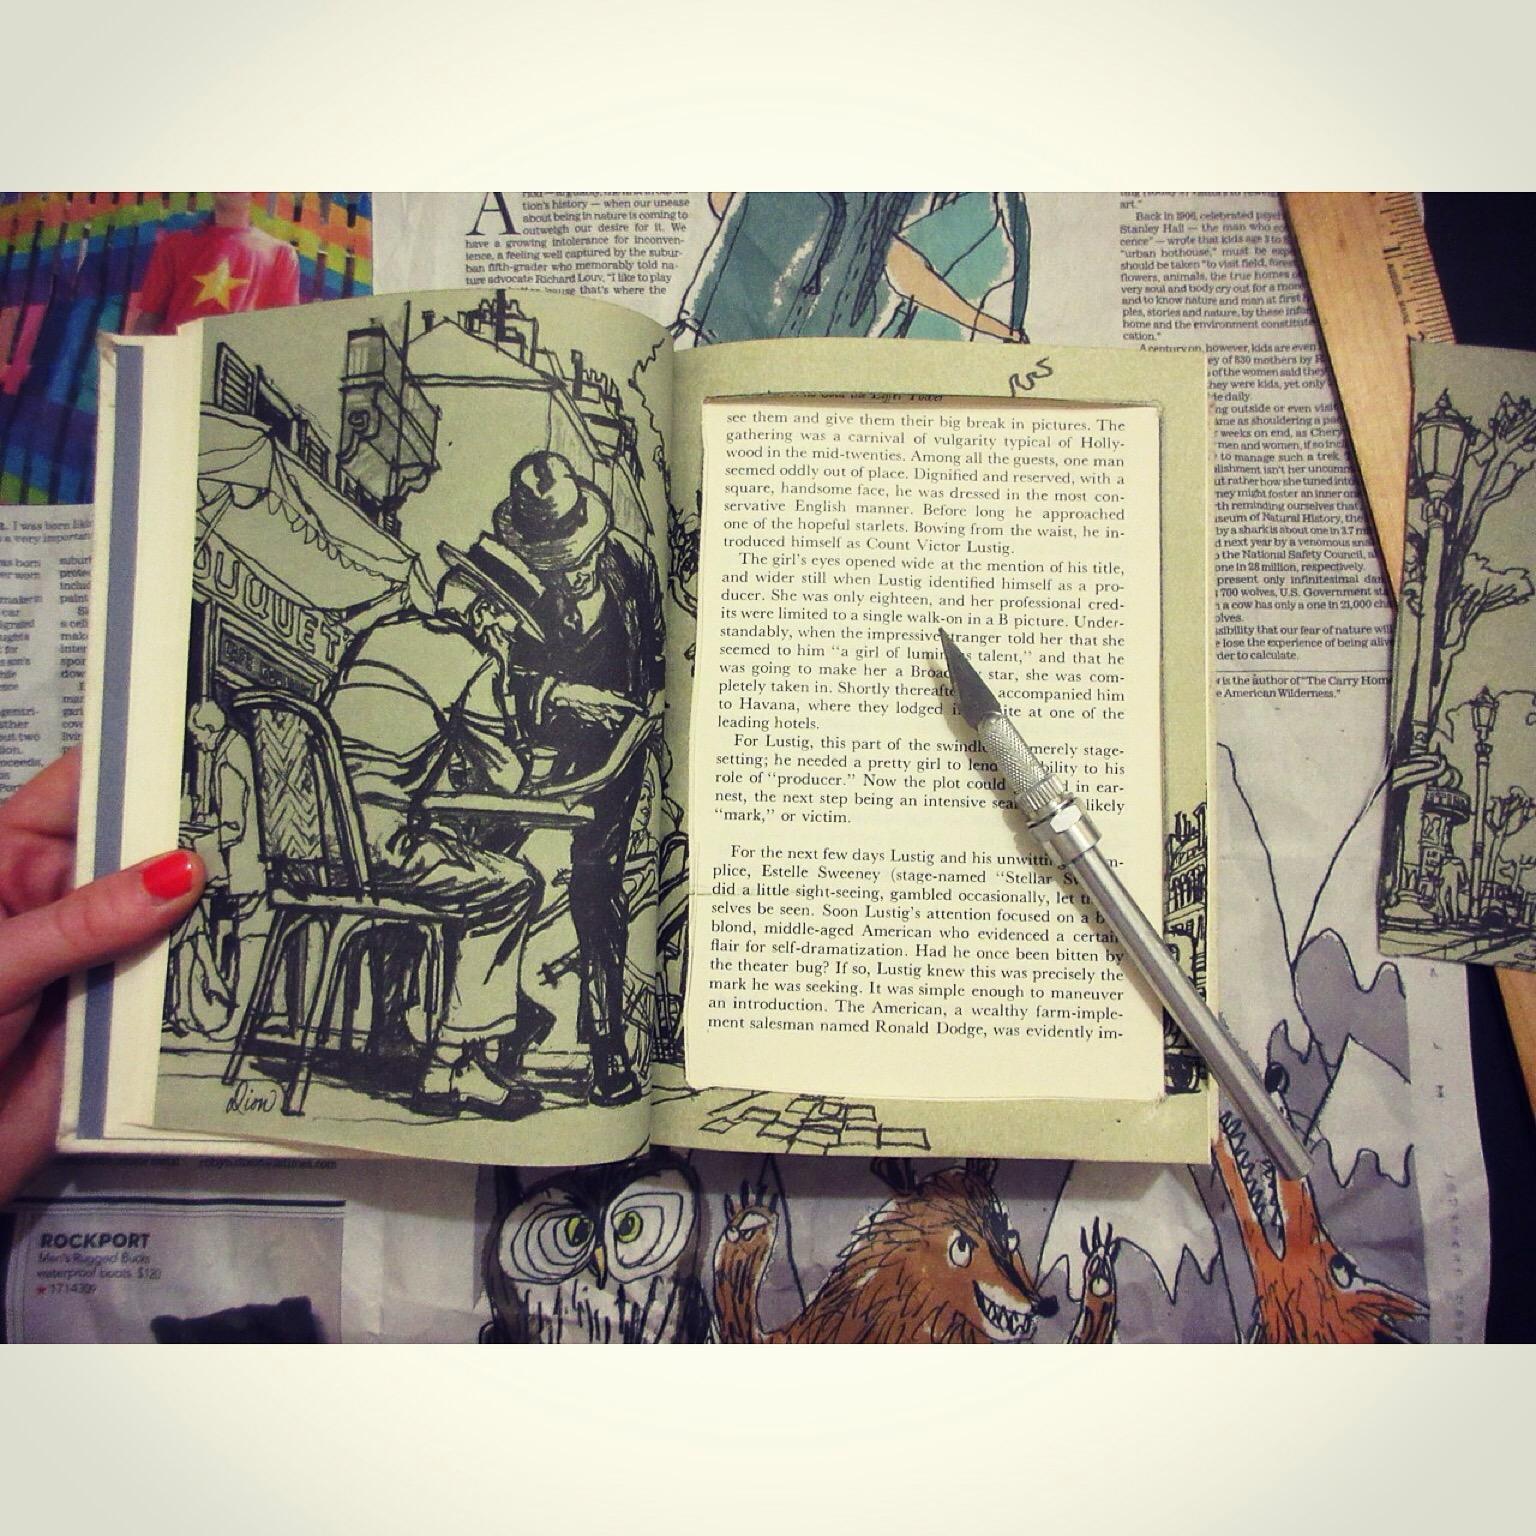 DIY: Repurposed Booksafe - Sustainable Daisy